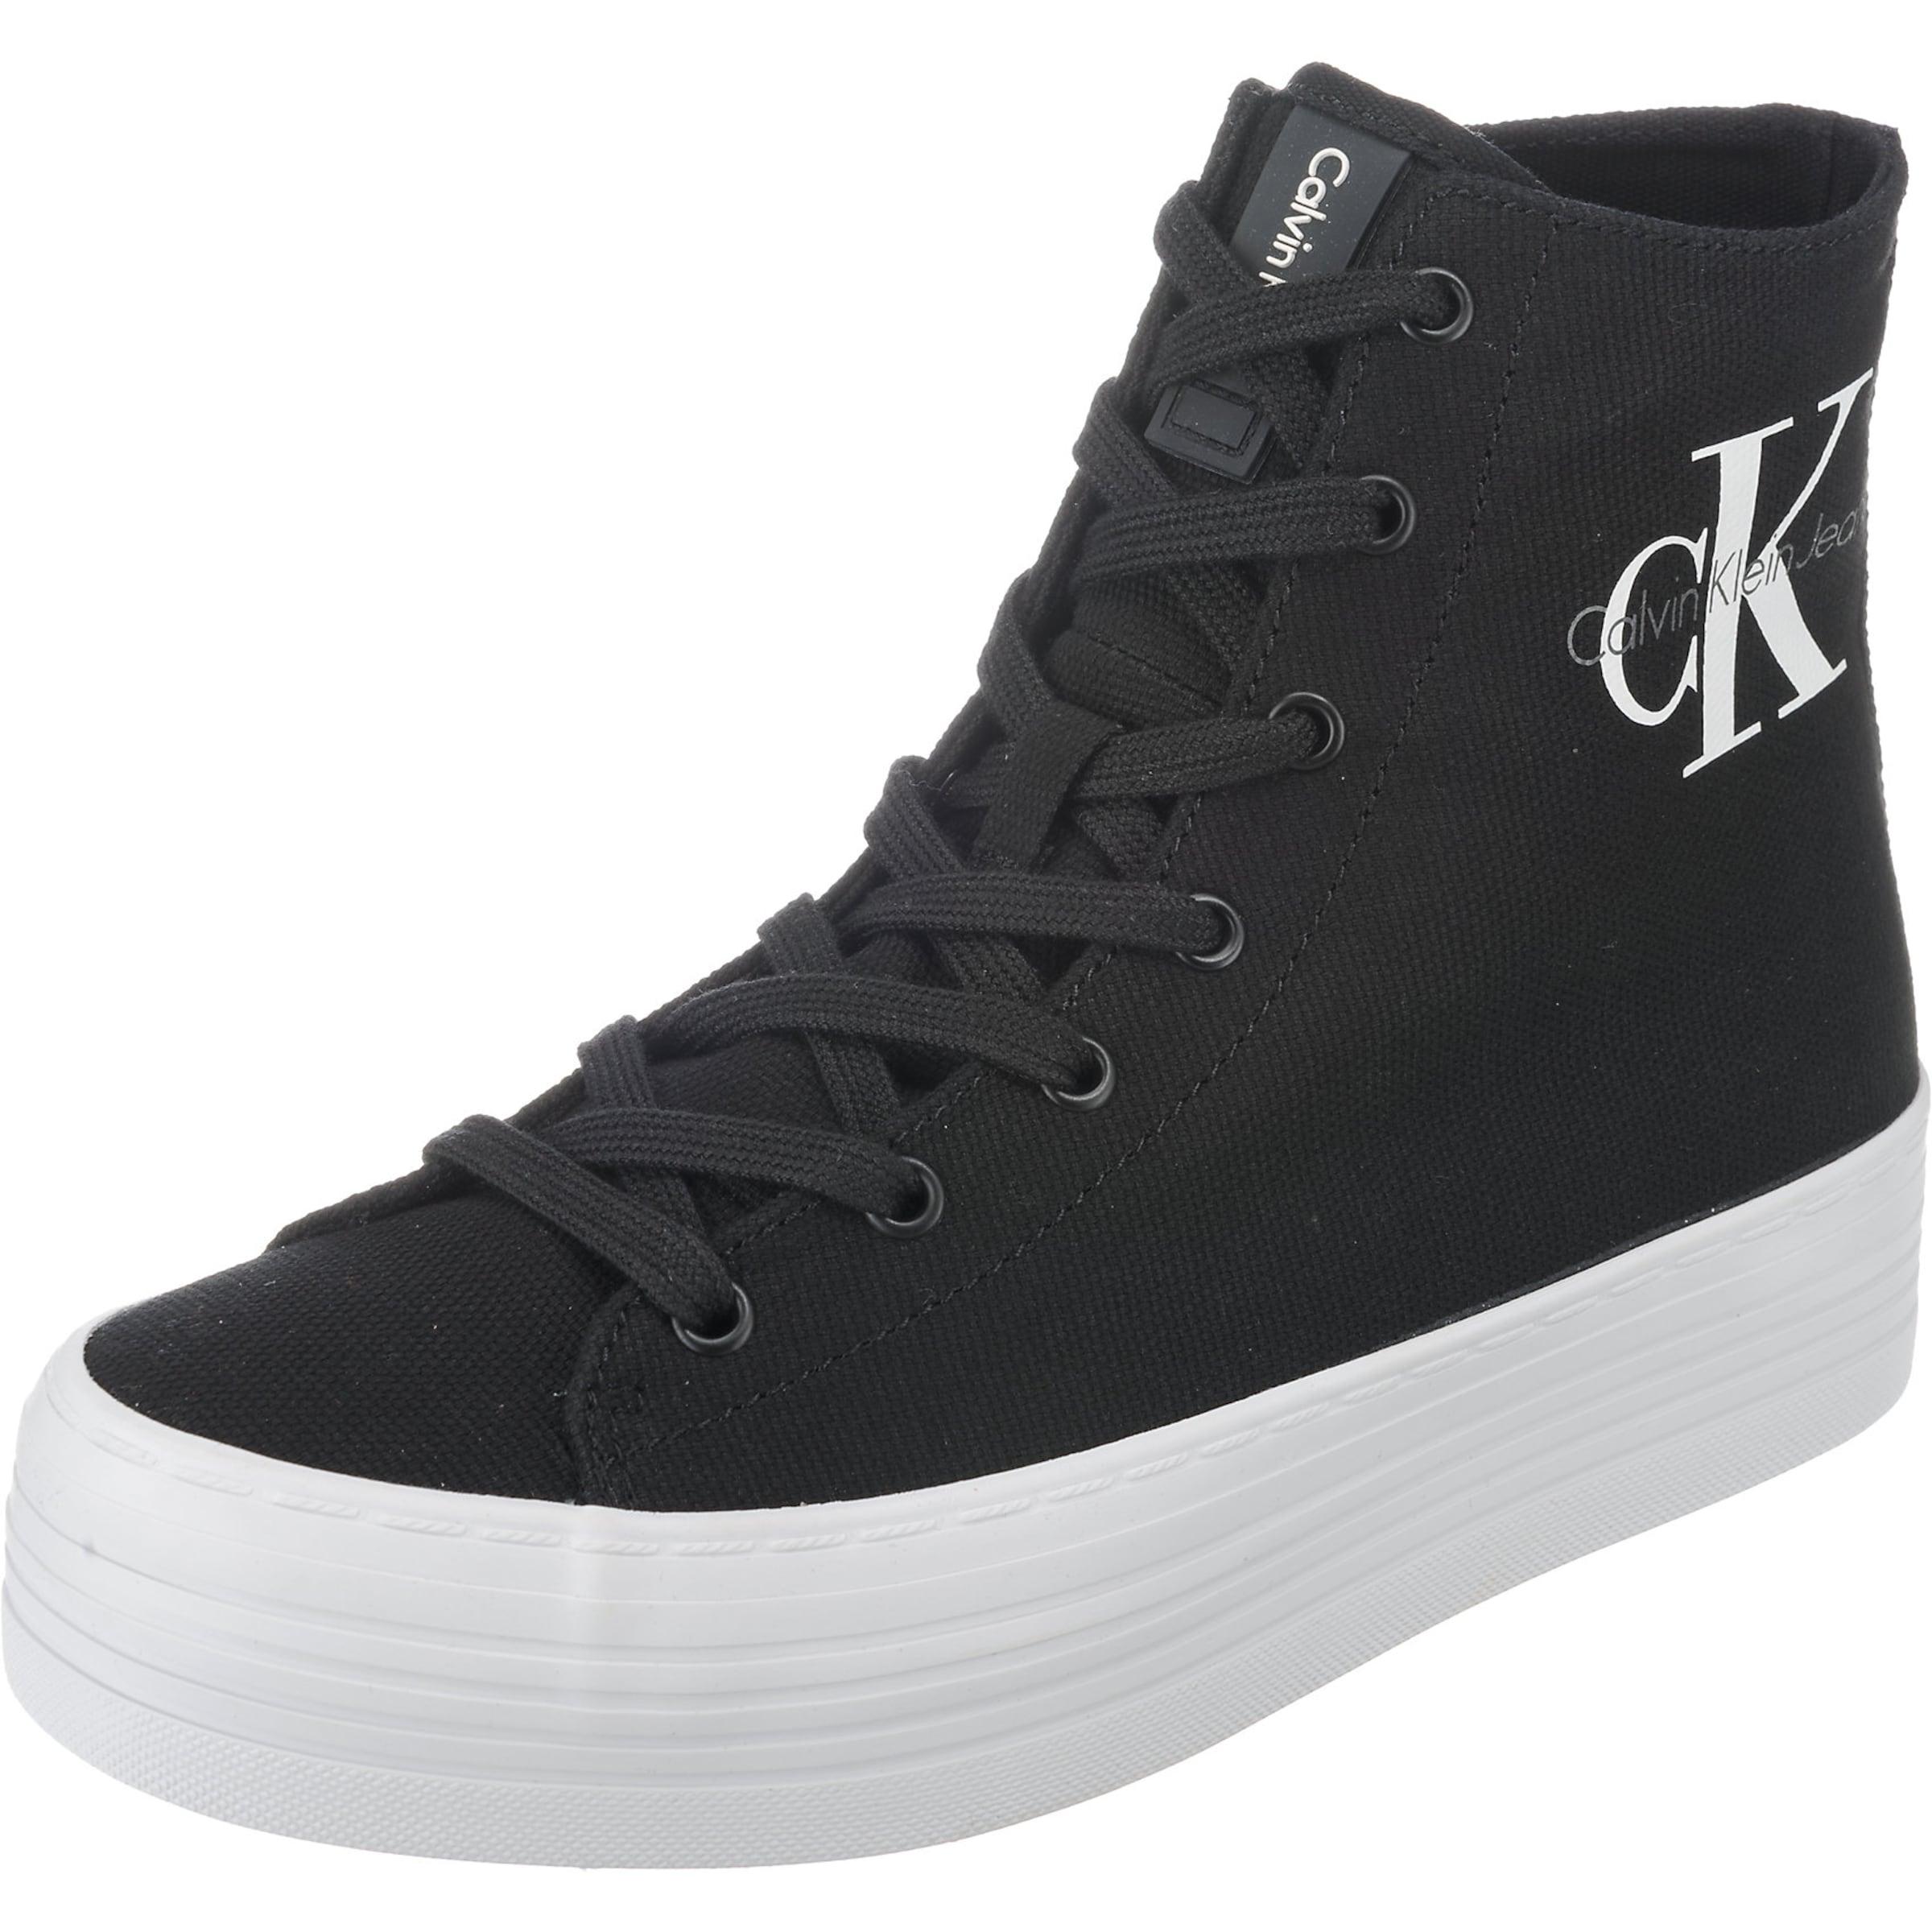 Auslass Visa Zahlung Calvin Klein Jeans ZABRINA CANVAS Sneakers High Billig Kaufen Shop DZZ9h